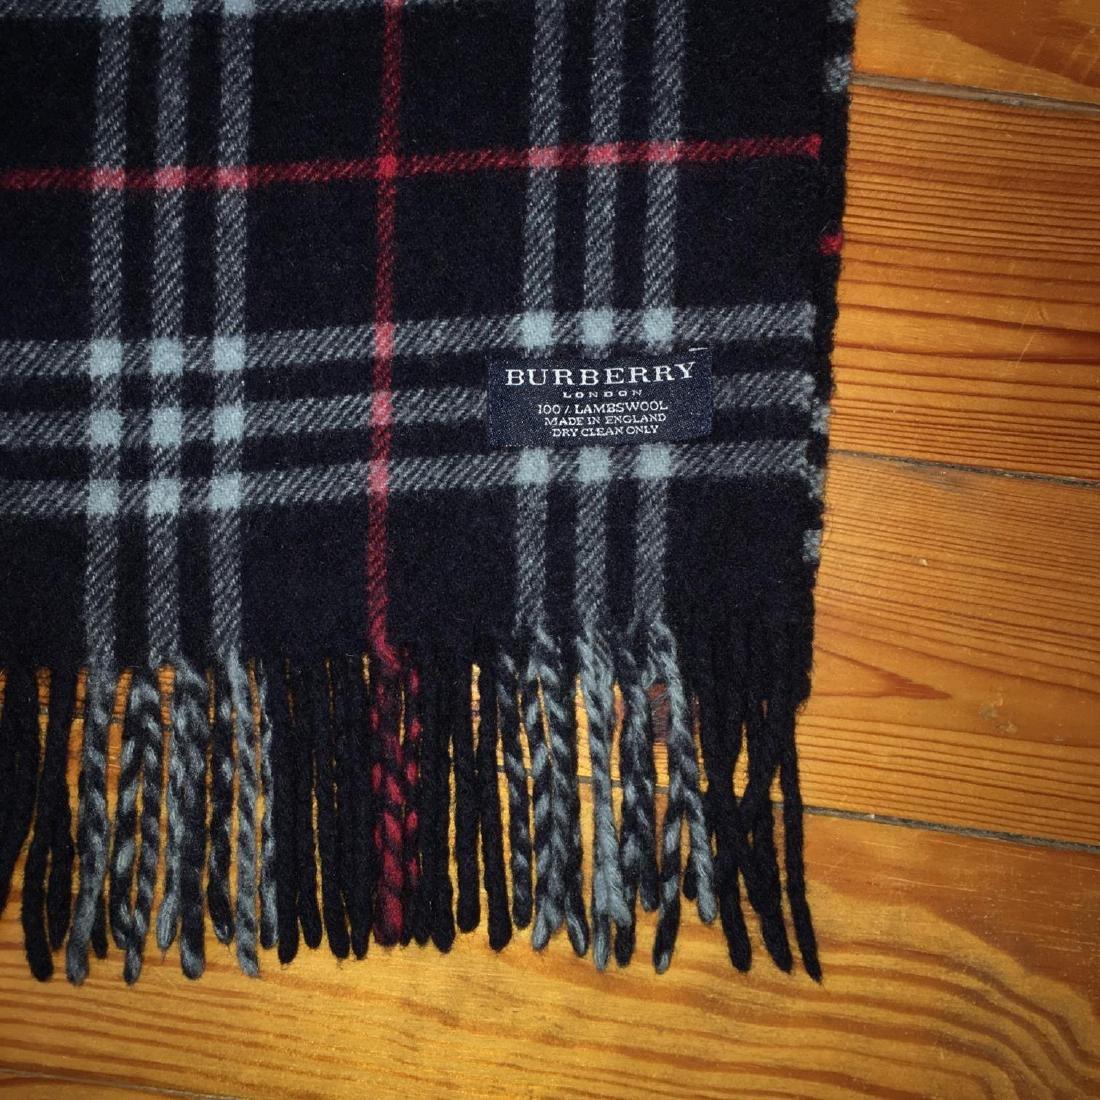 Burberry 100% Lambswool Dark Blue Nova Check Scarf - 4